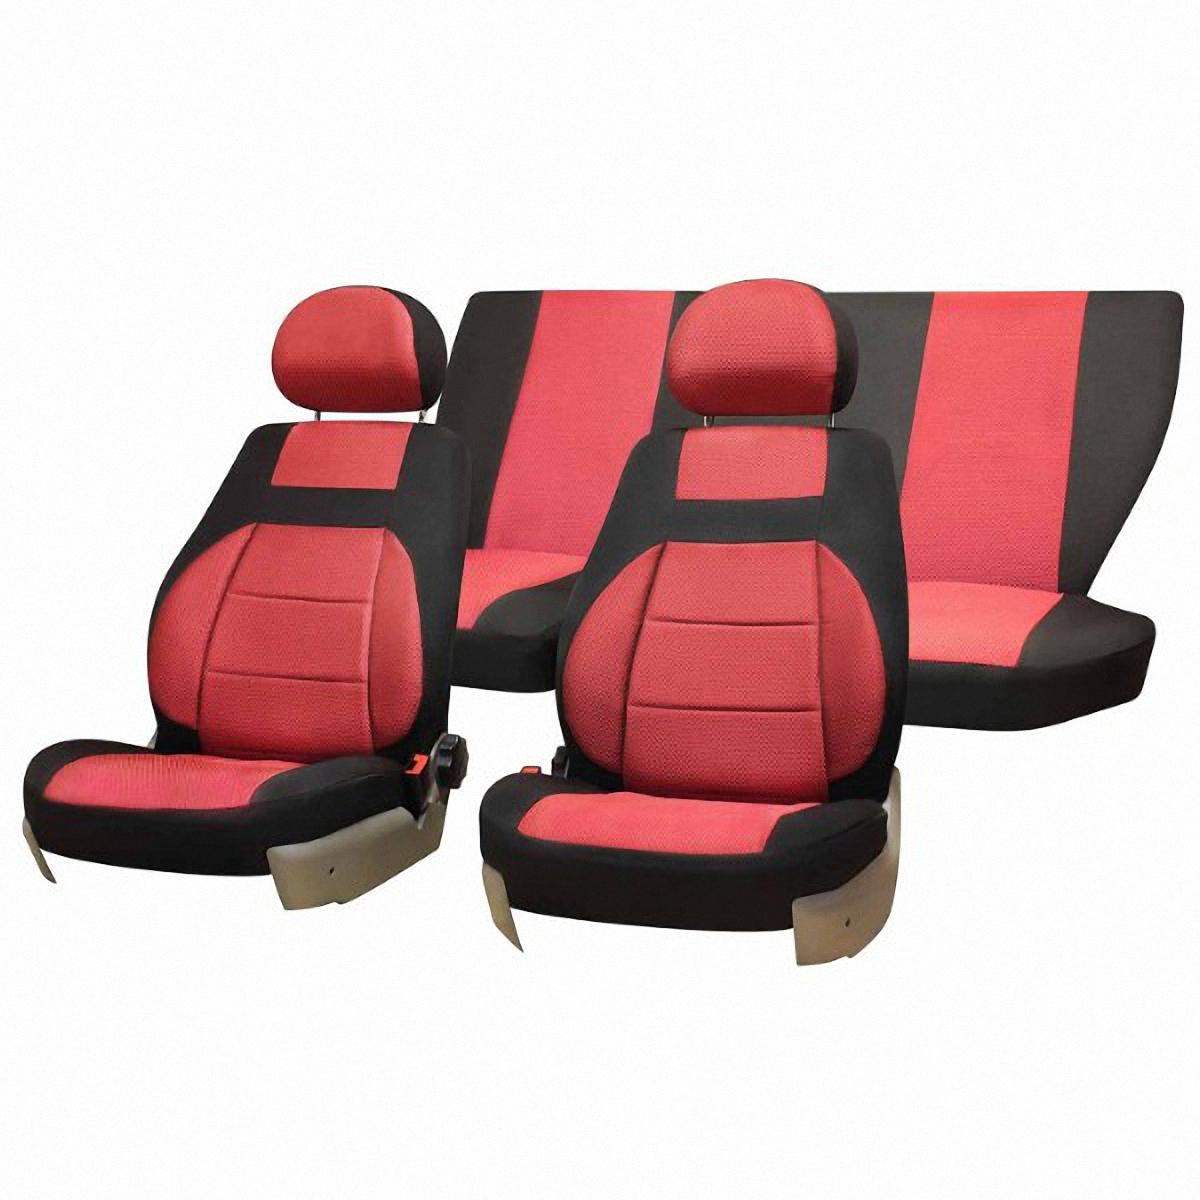 Чехол на сиденье Skyway ВАЗ-2107, 6 шт. V012-D3 колонка rexant 2107 18 2107 black